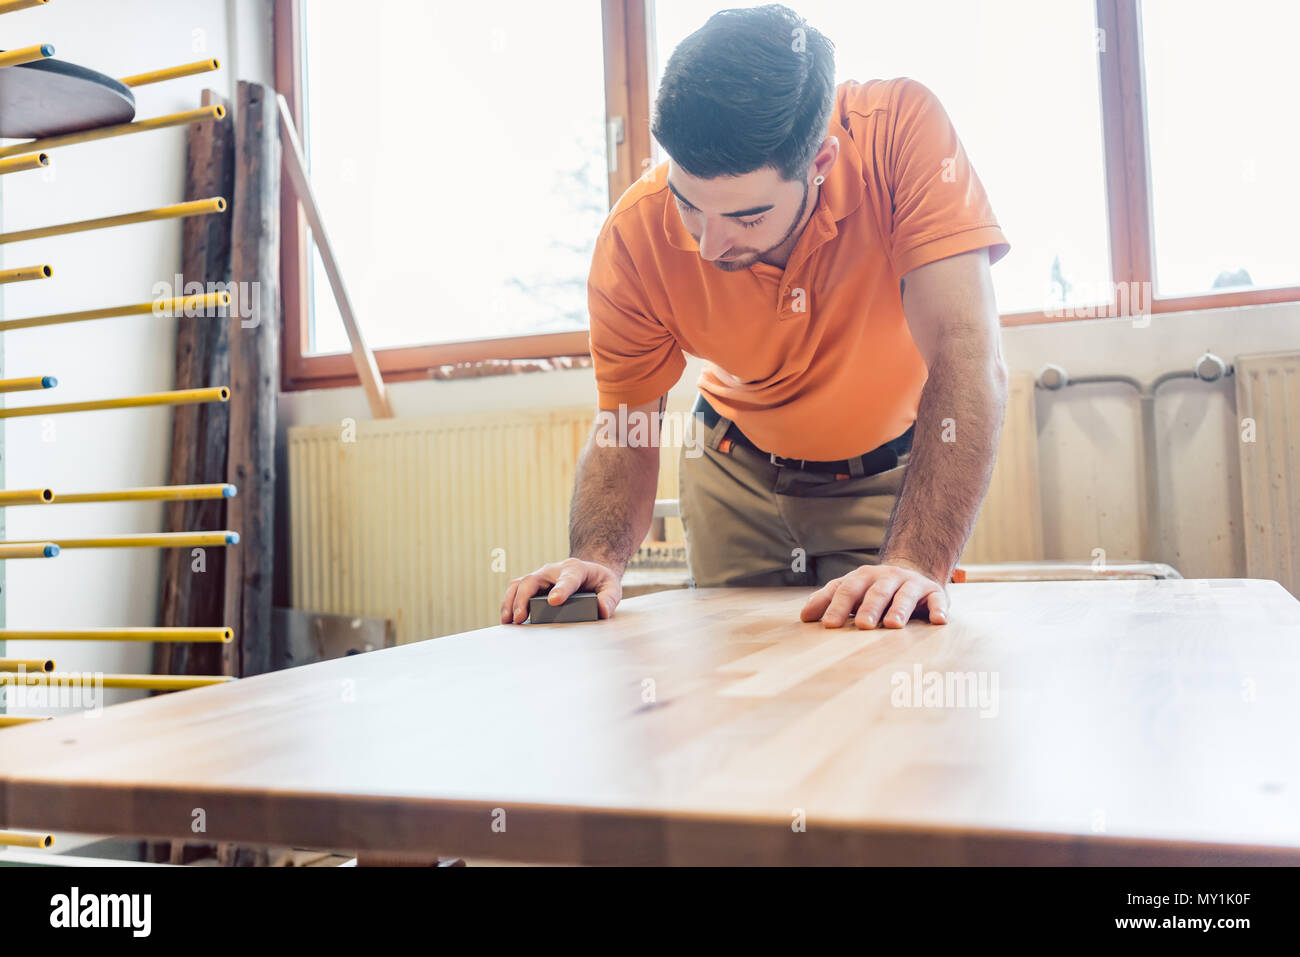 Carpenter polishing and varnishing a table - Stock Image